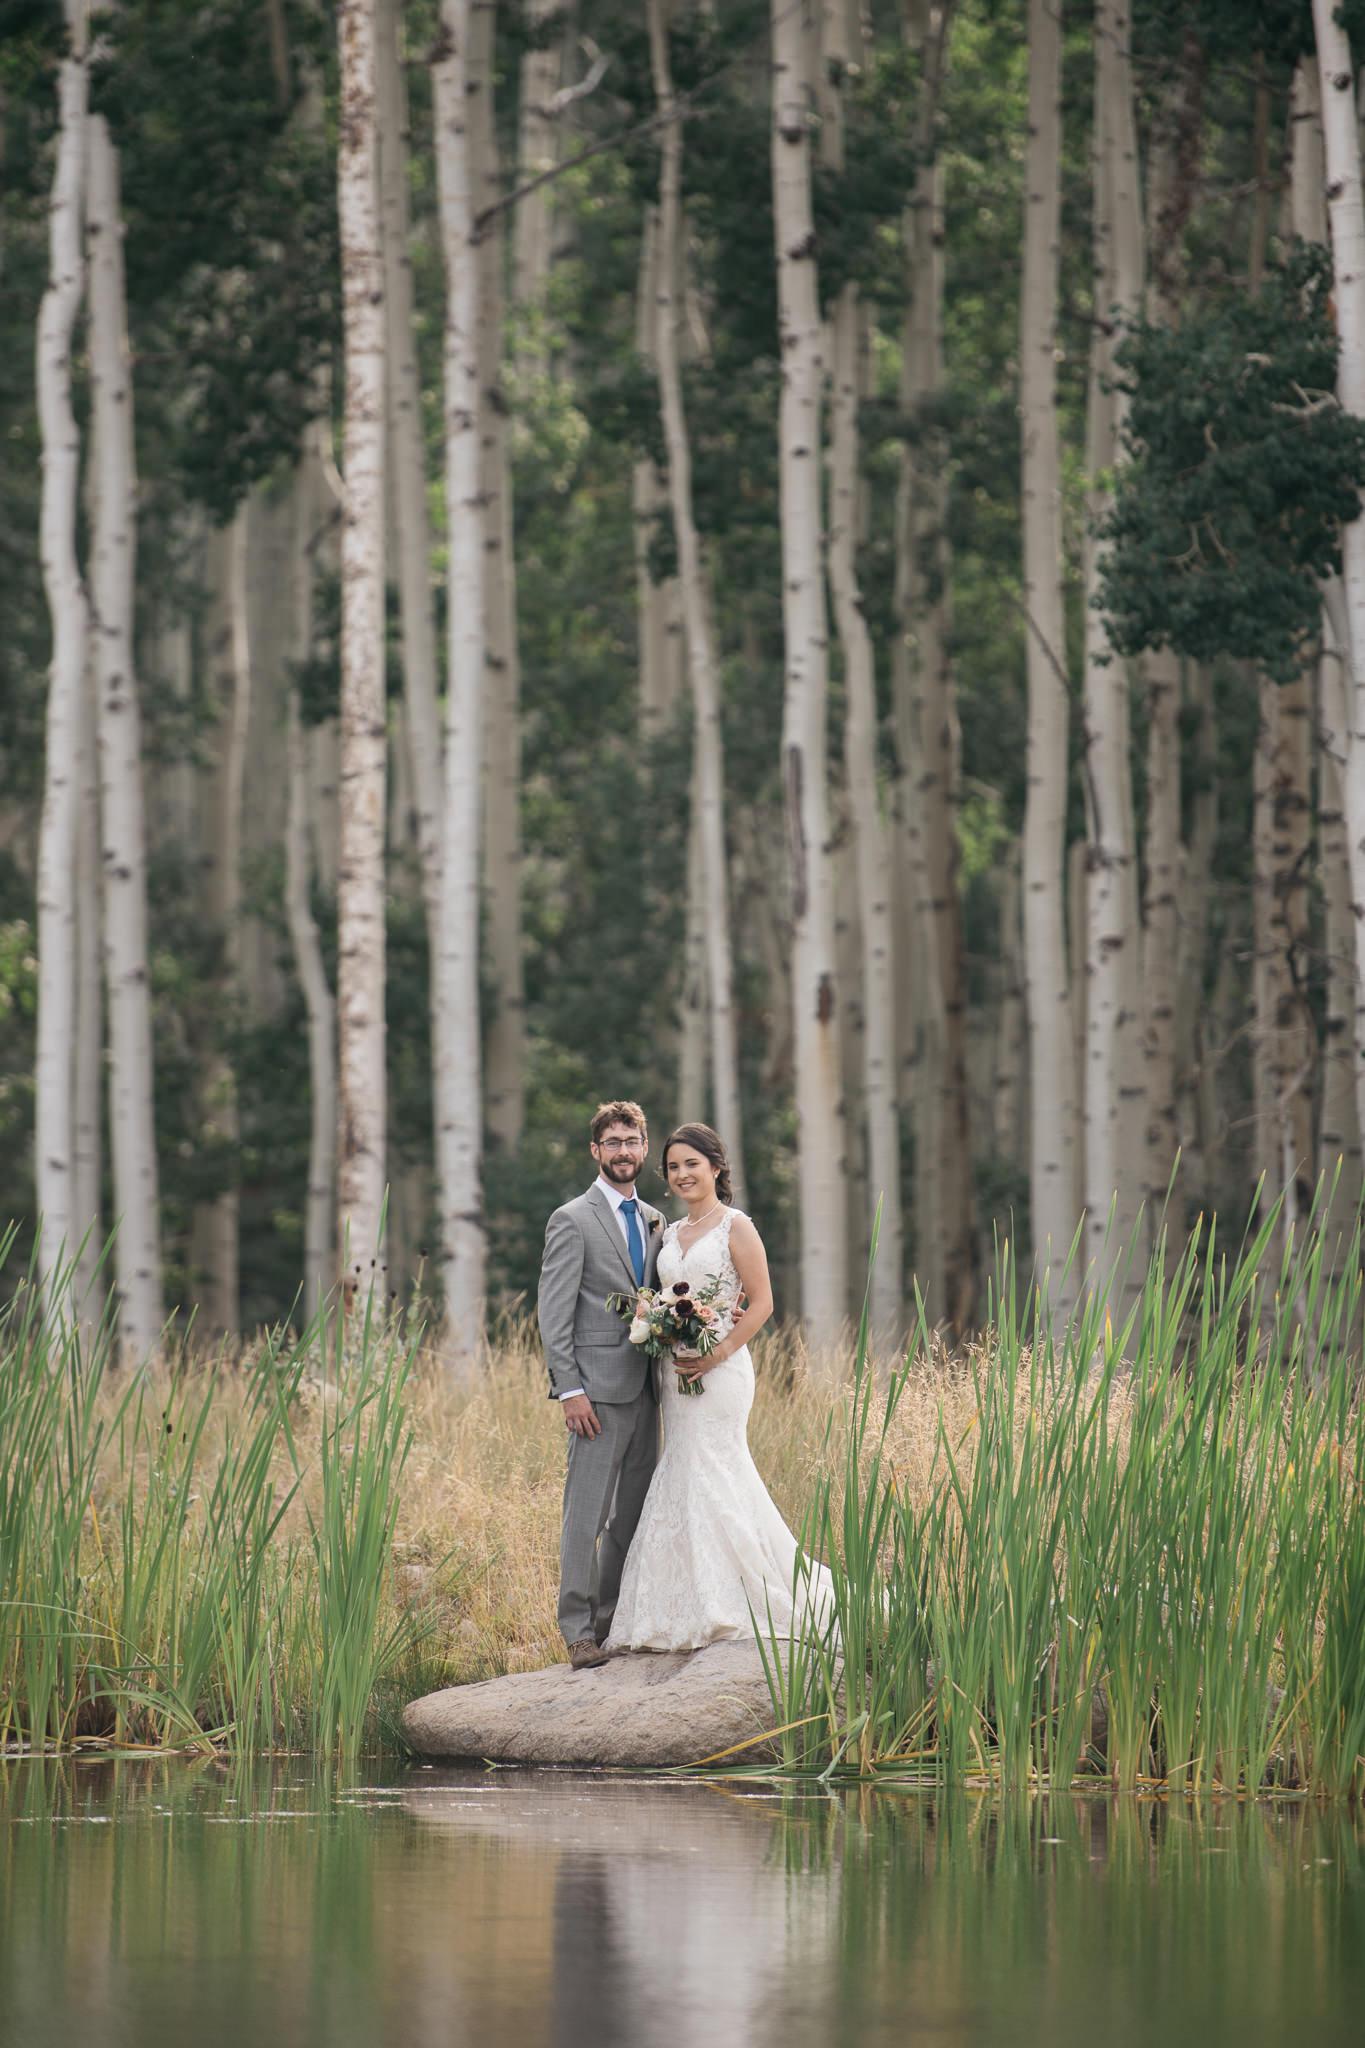 394_ONL_Kat_Nick_Wedding_Trevor_Hooper_Photo.jpg